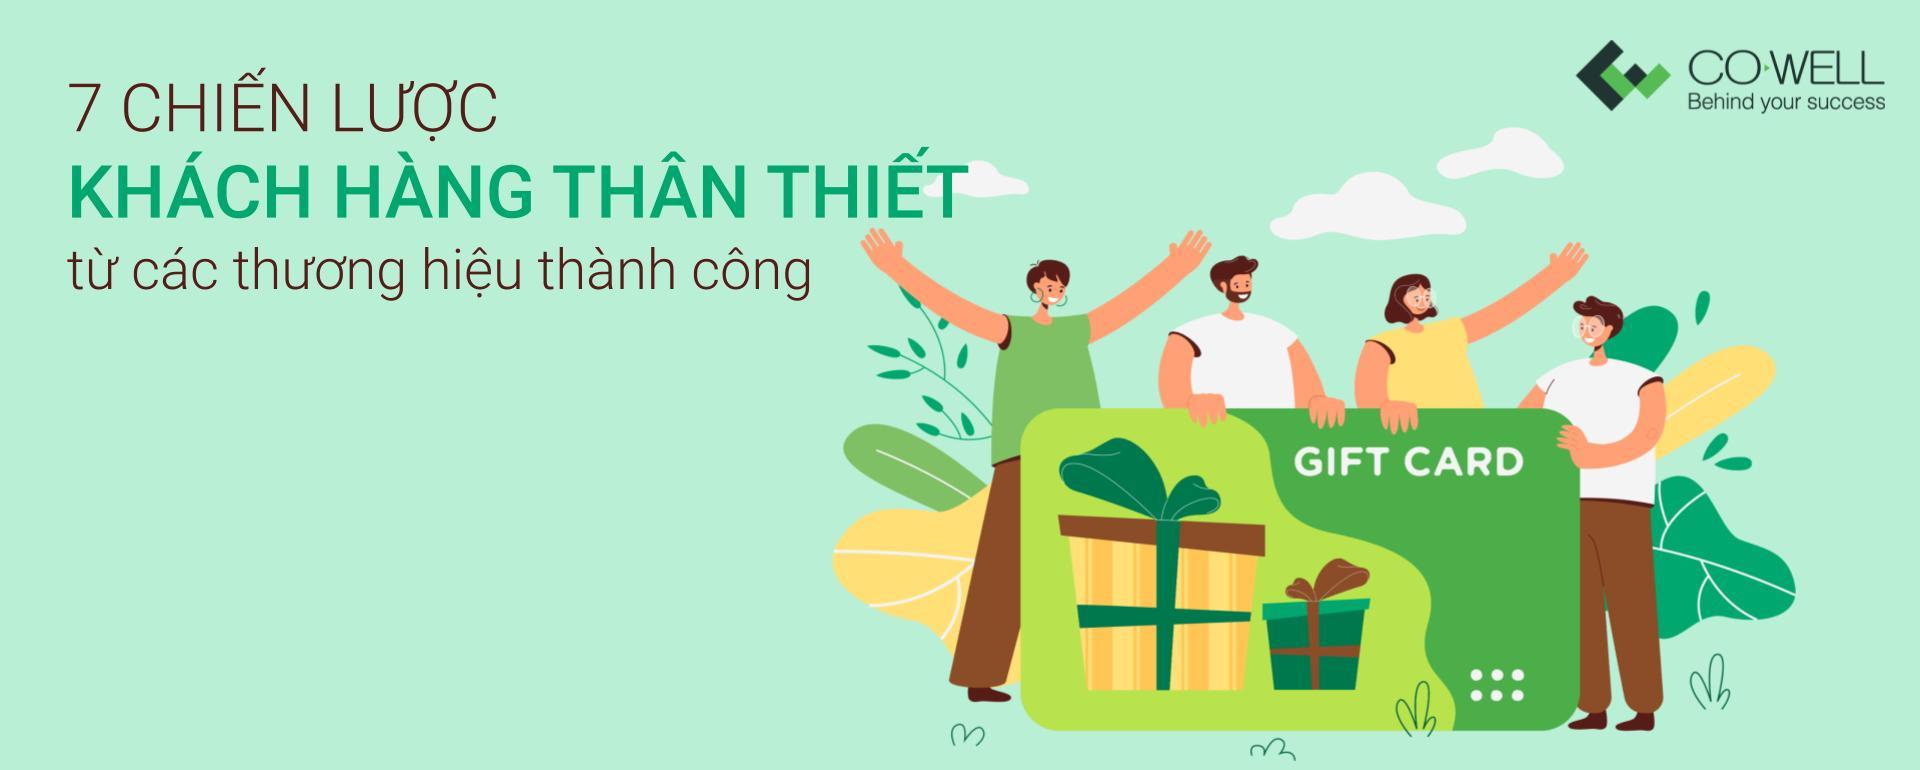 7 chuong trinh khach hang than thiet feature